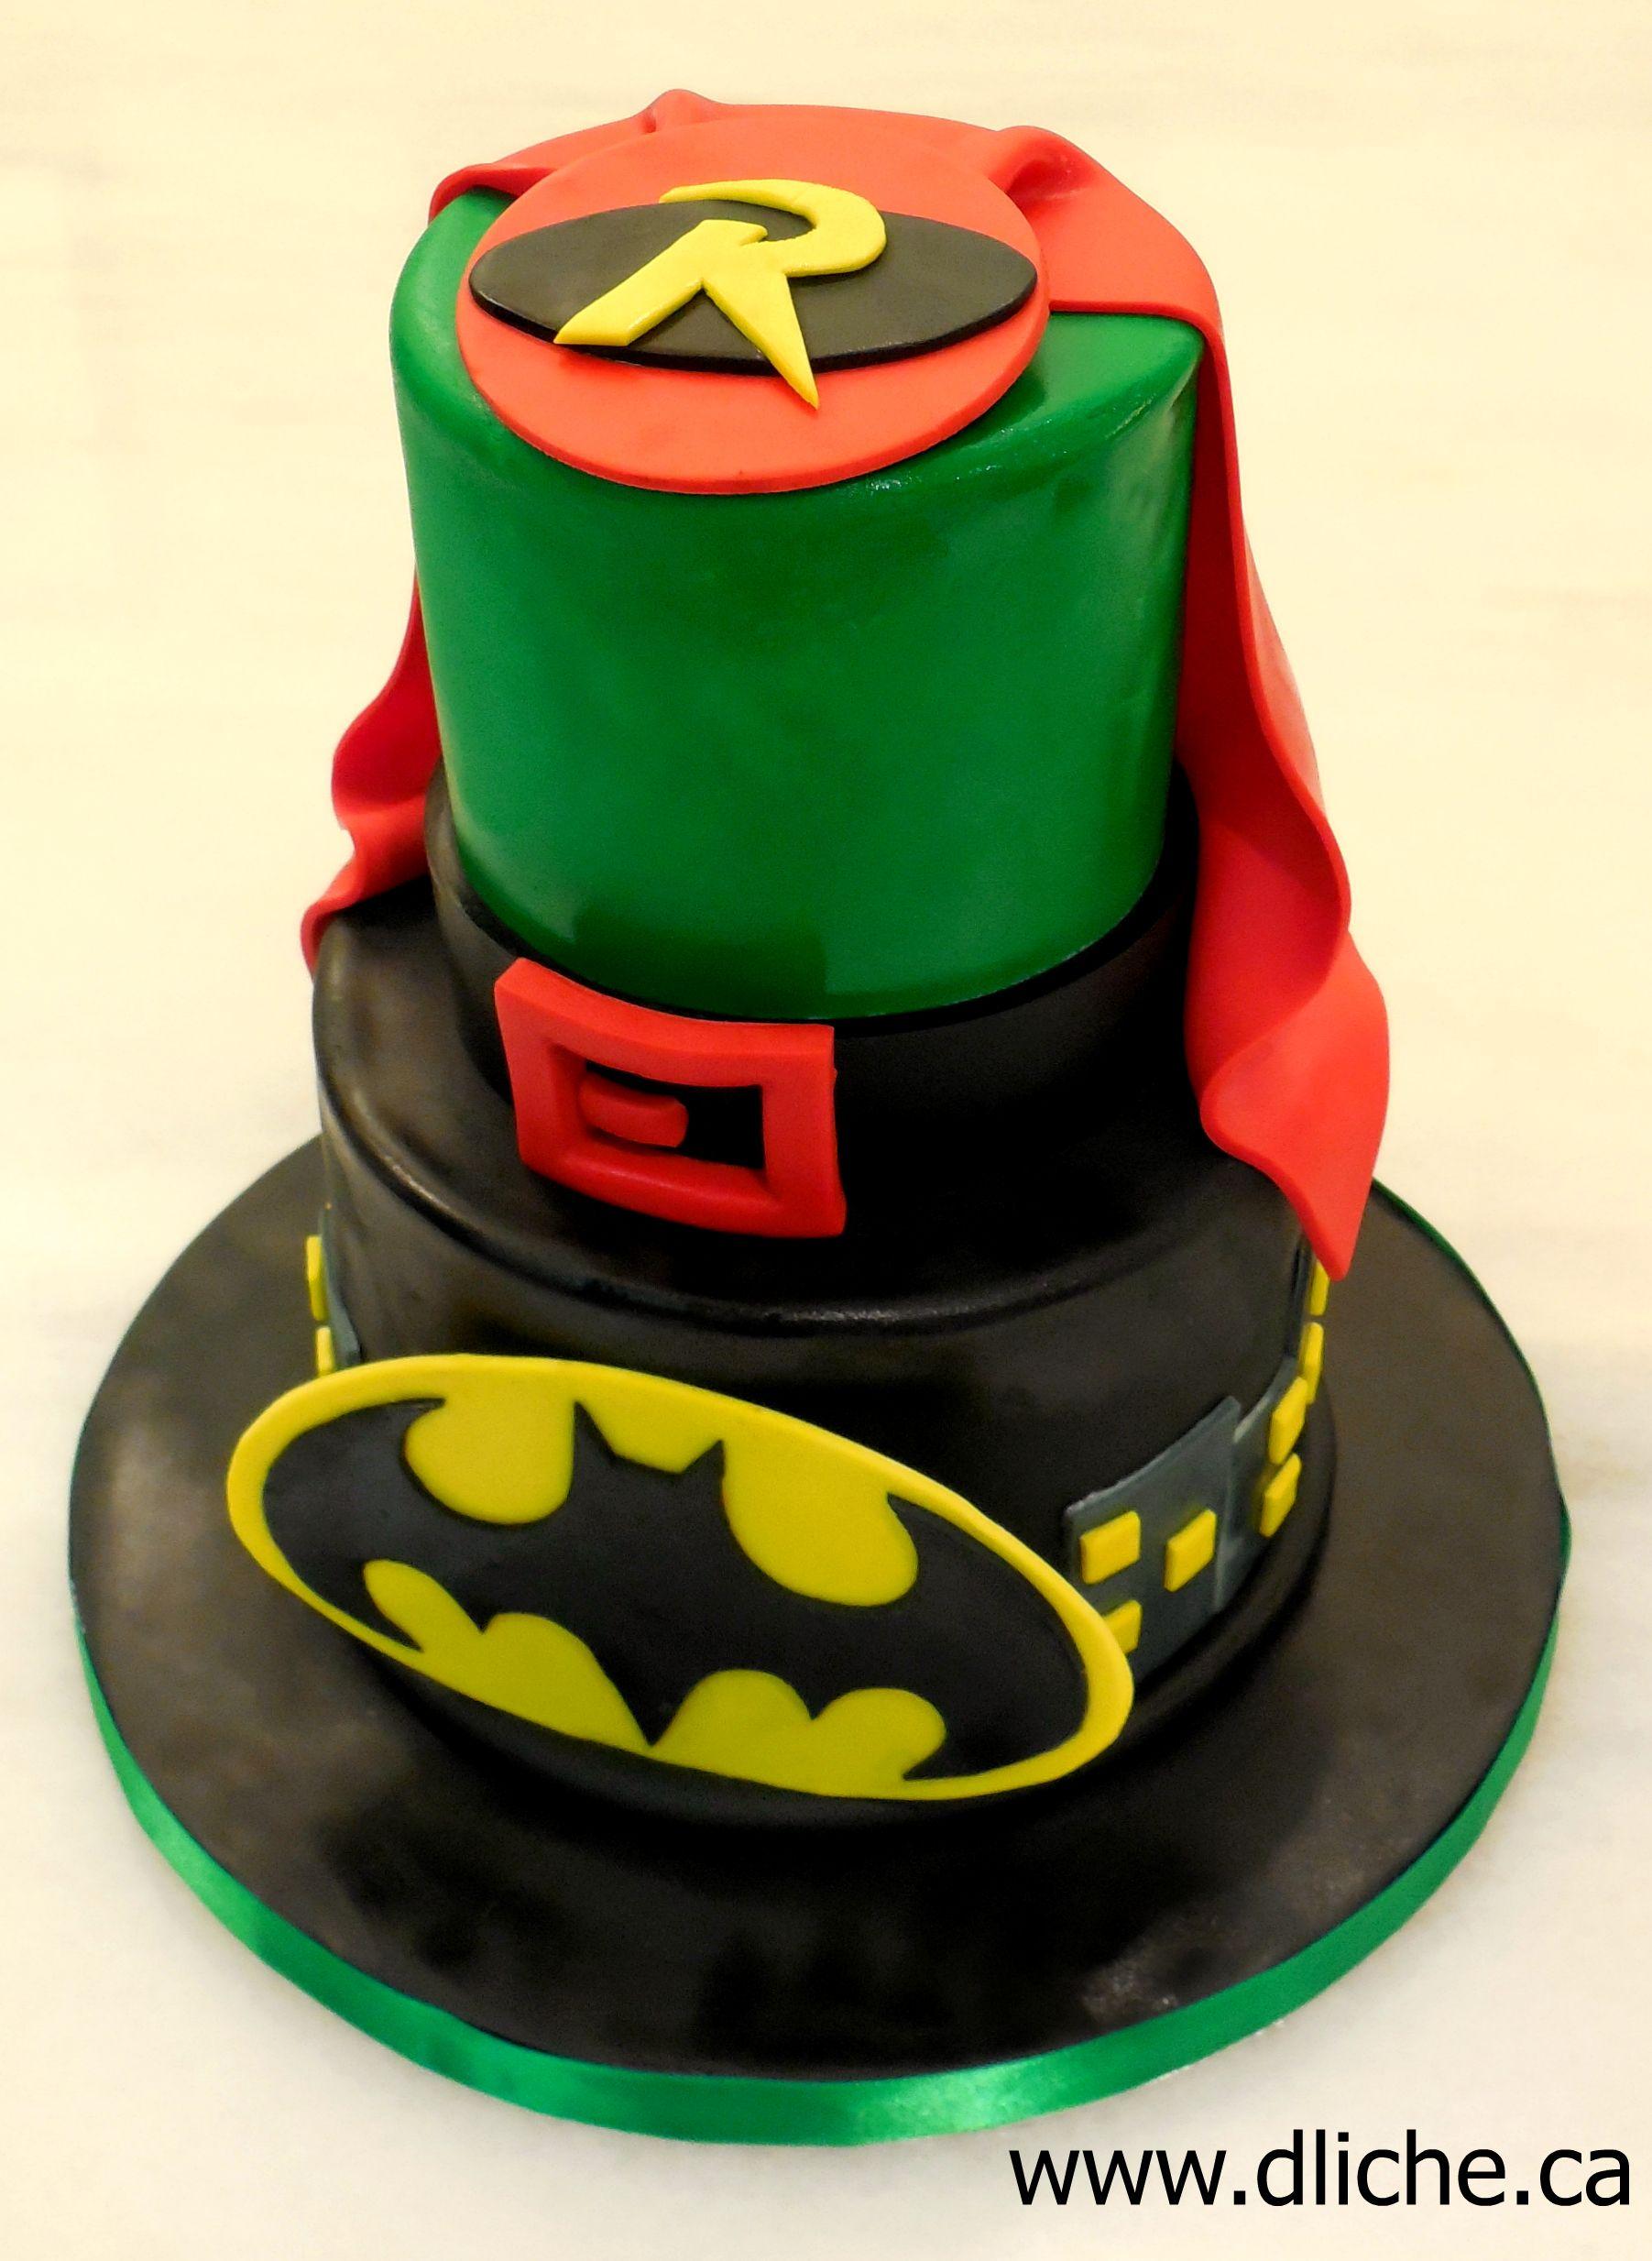 Batman \u0026 Robin. Fete AnniversaireGâteaux